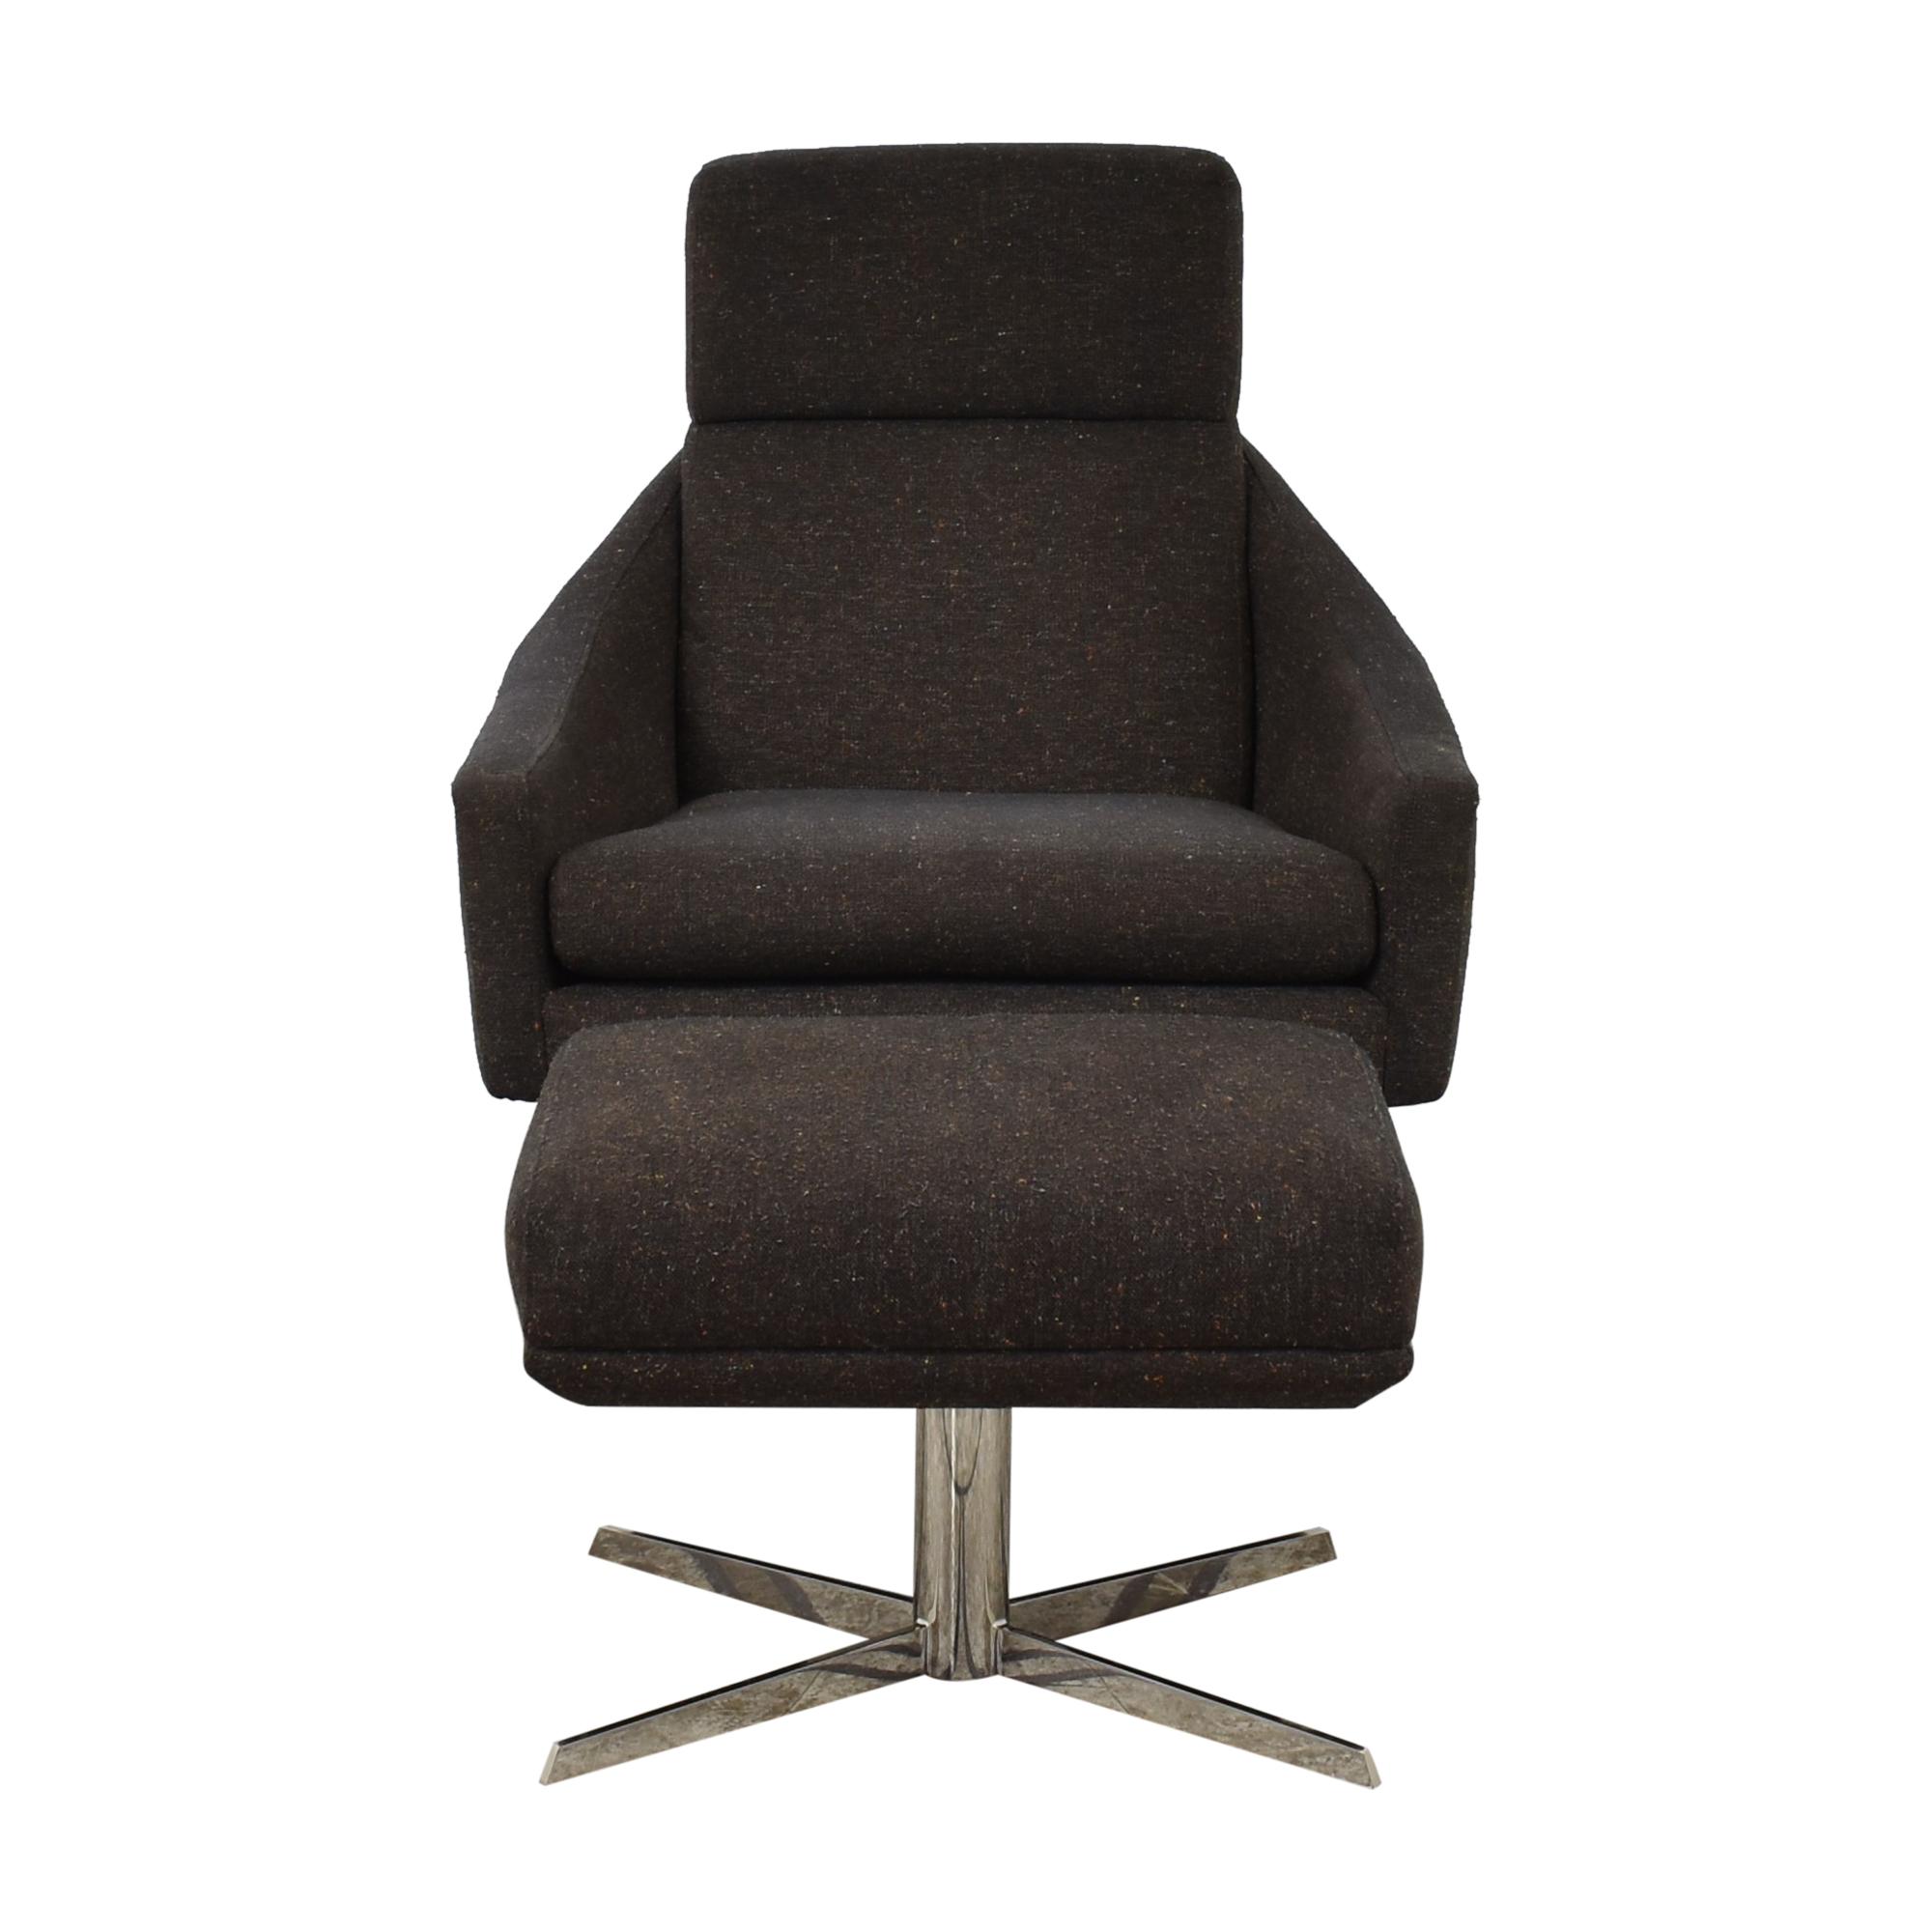 West Elm West Elm Austin Swivel Arm Chair with Ottoman pa